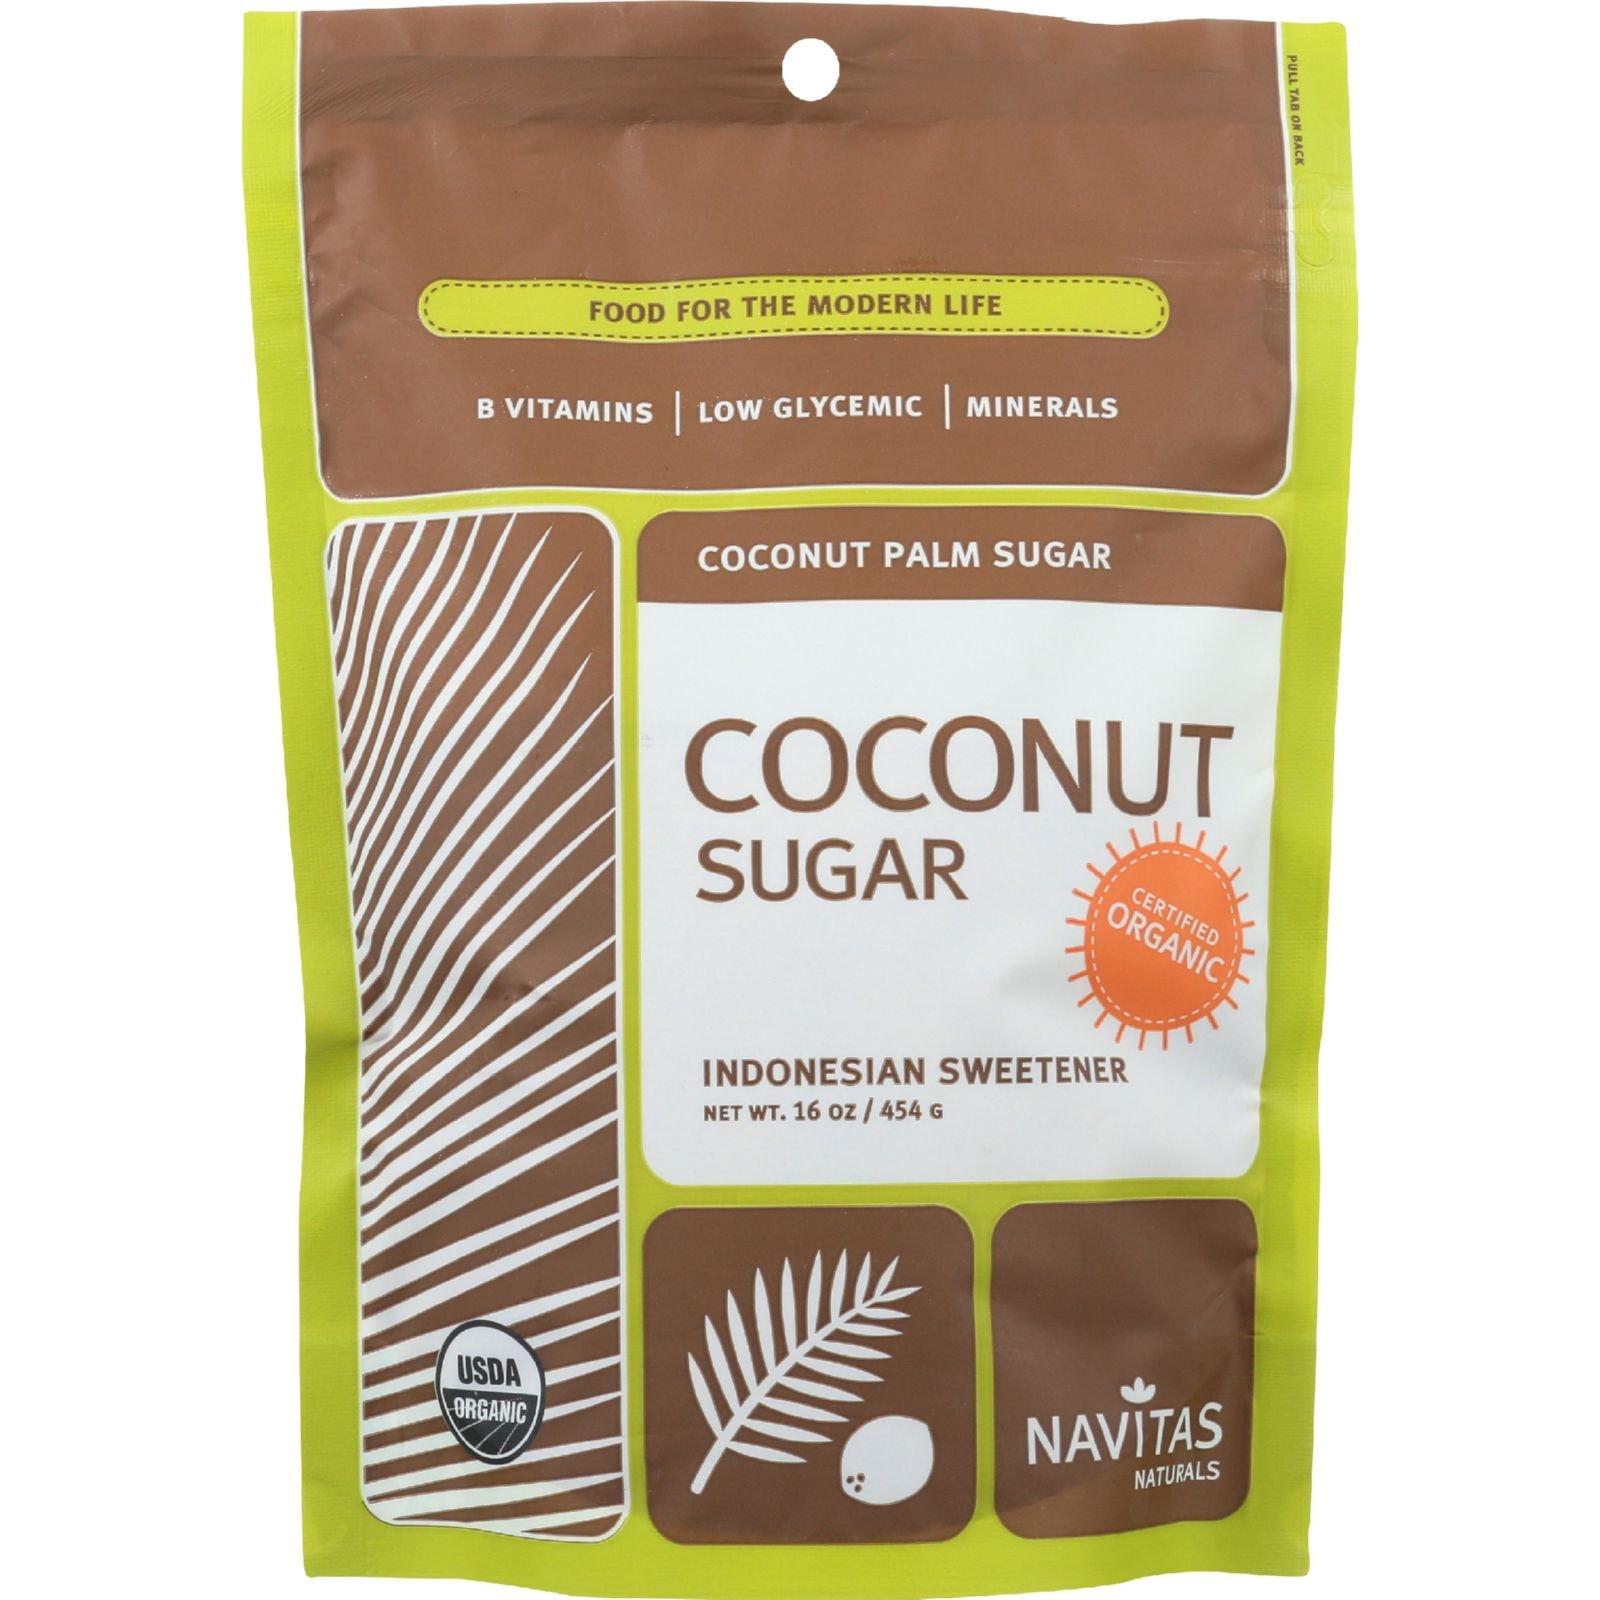 Navitas Naturals Coconut Palm Sugar - Organic - 16 oz - case of 6 - 95%+ Organic - Yeast Free - Wheat Free-Vegan by Navitas Naturals